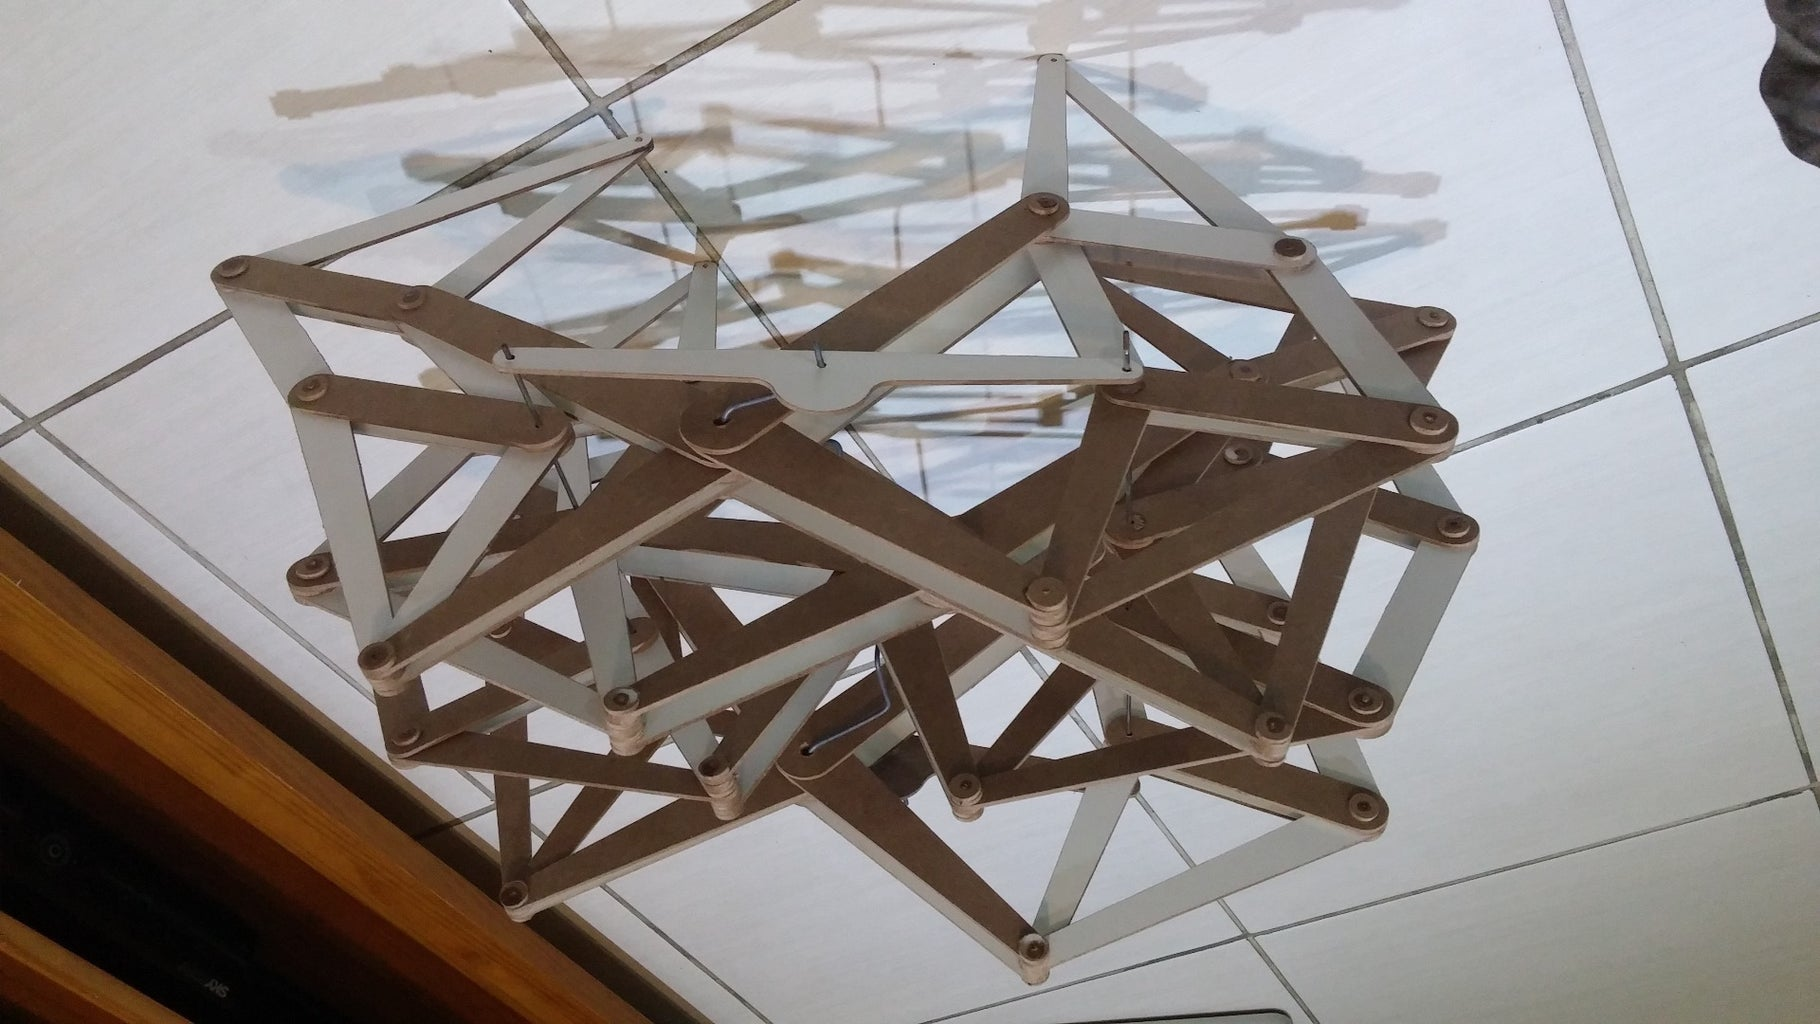 CNC Theo Jansen Mechanism (remix)